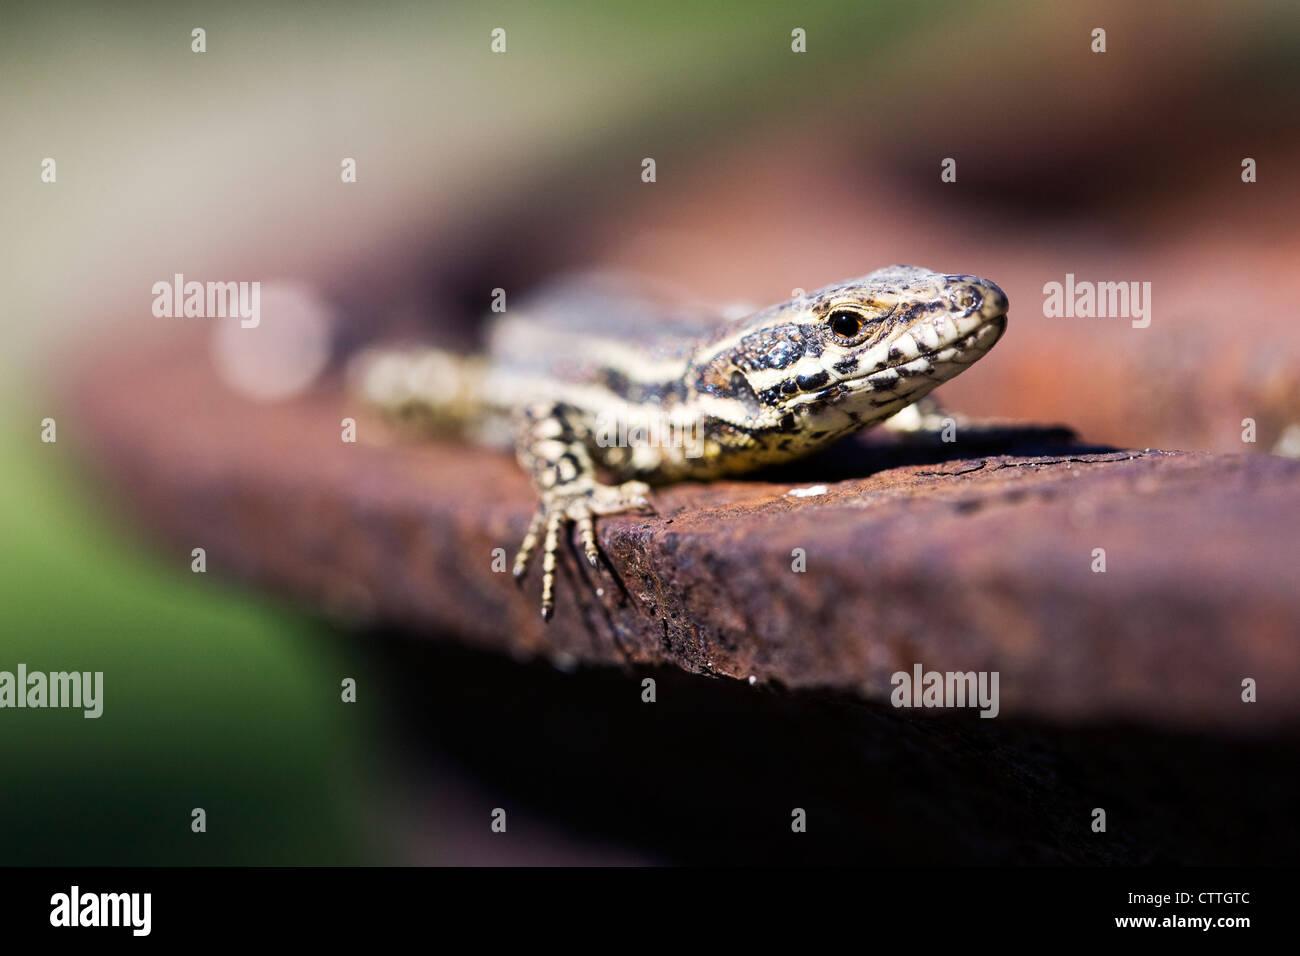 Podarcis muralis. Europaean wall lizard. - Stock Image